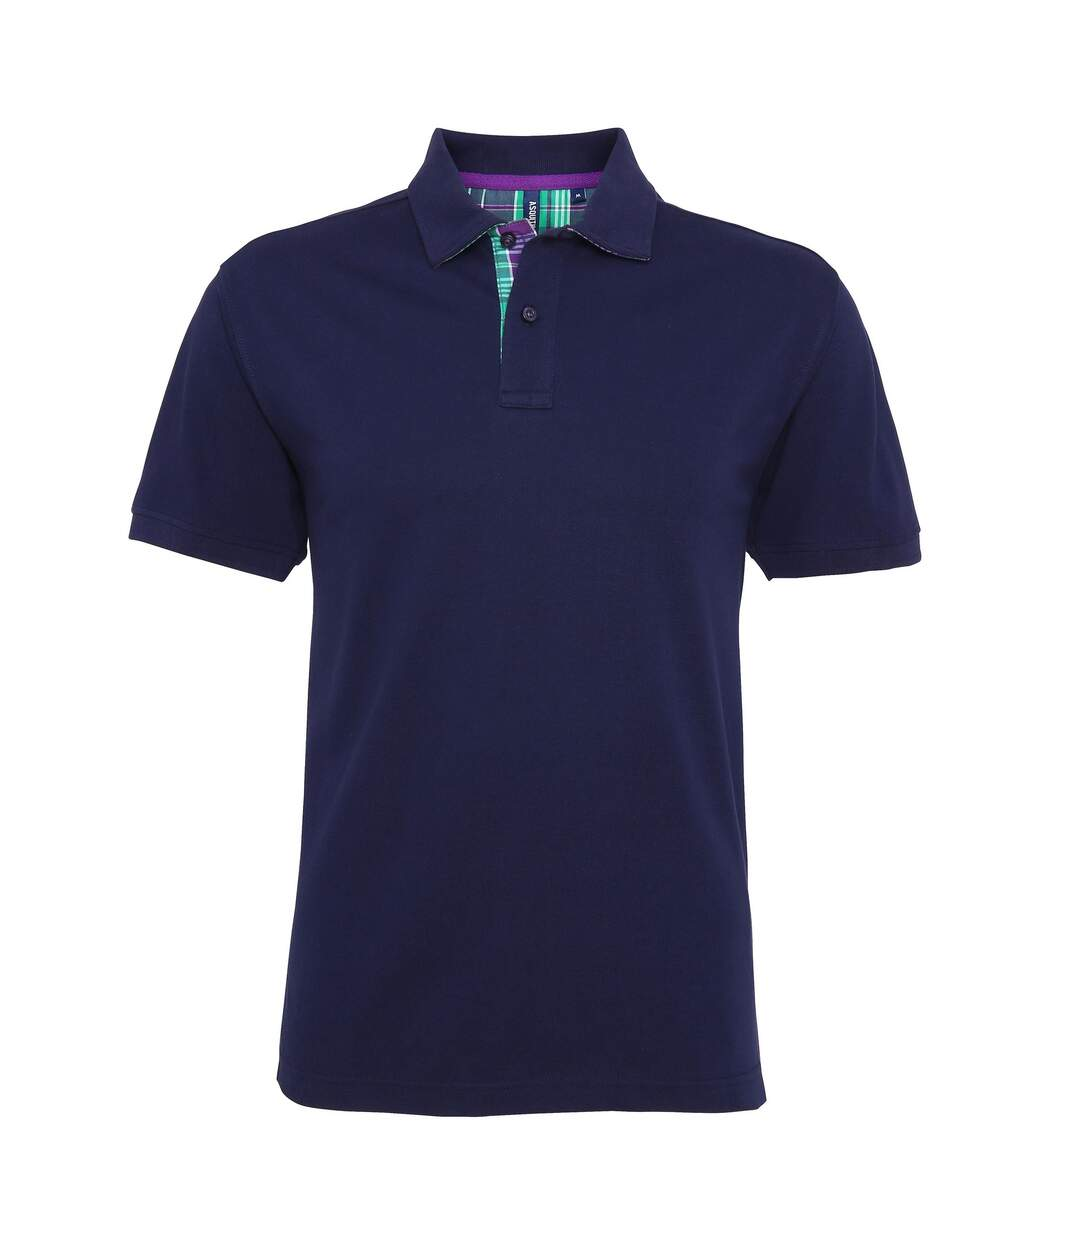 Asquith & Fox Mens Check Trim Polo Shirt (Black) - UTRW5038